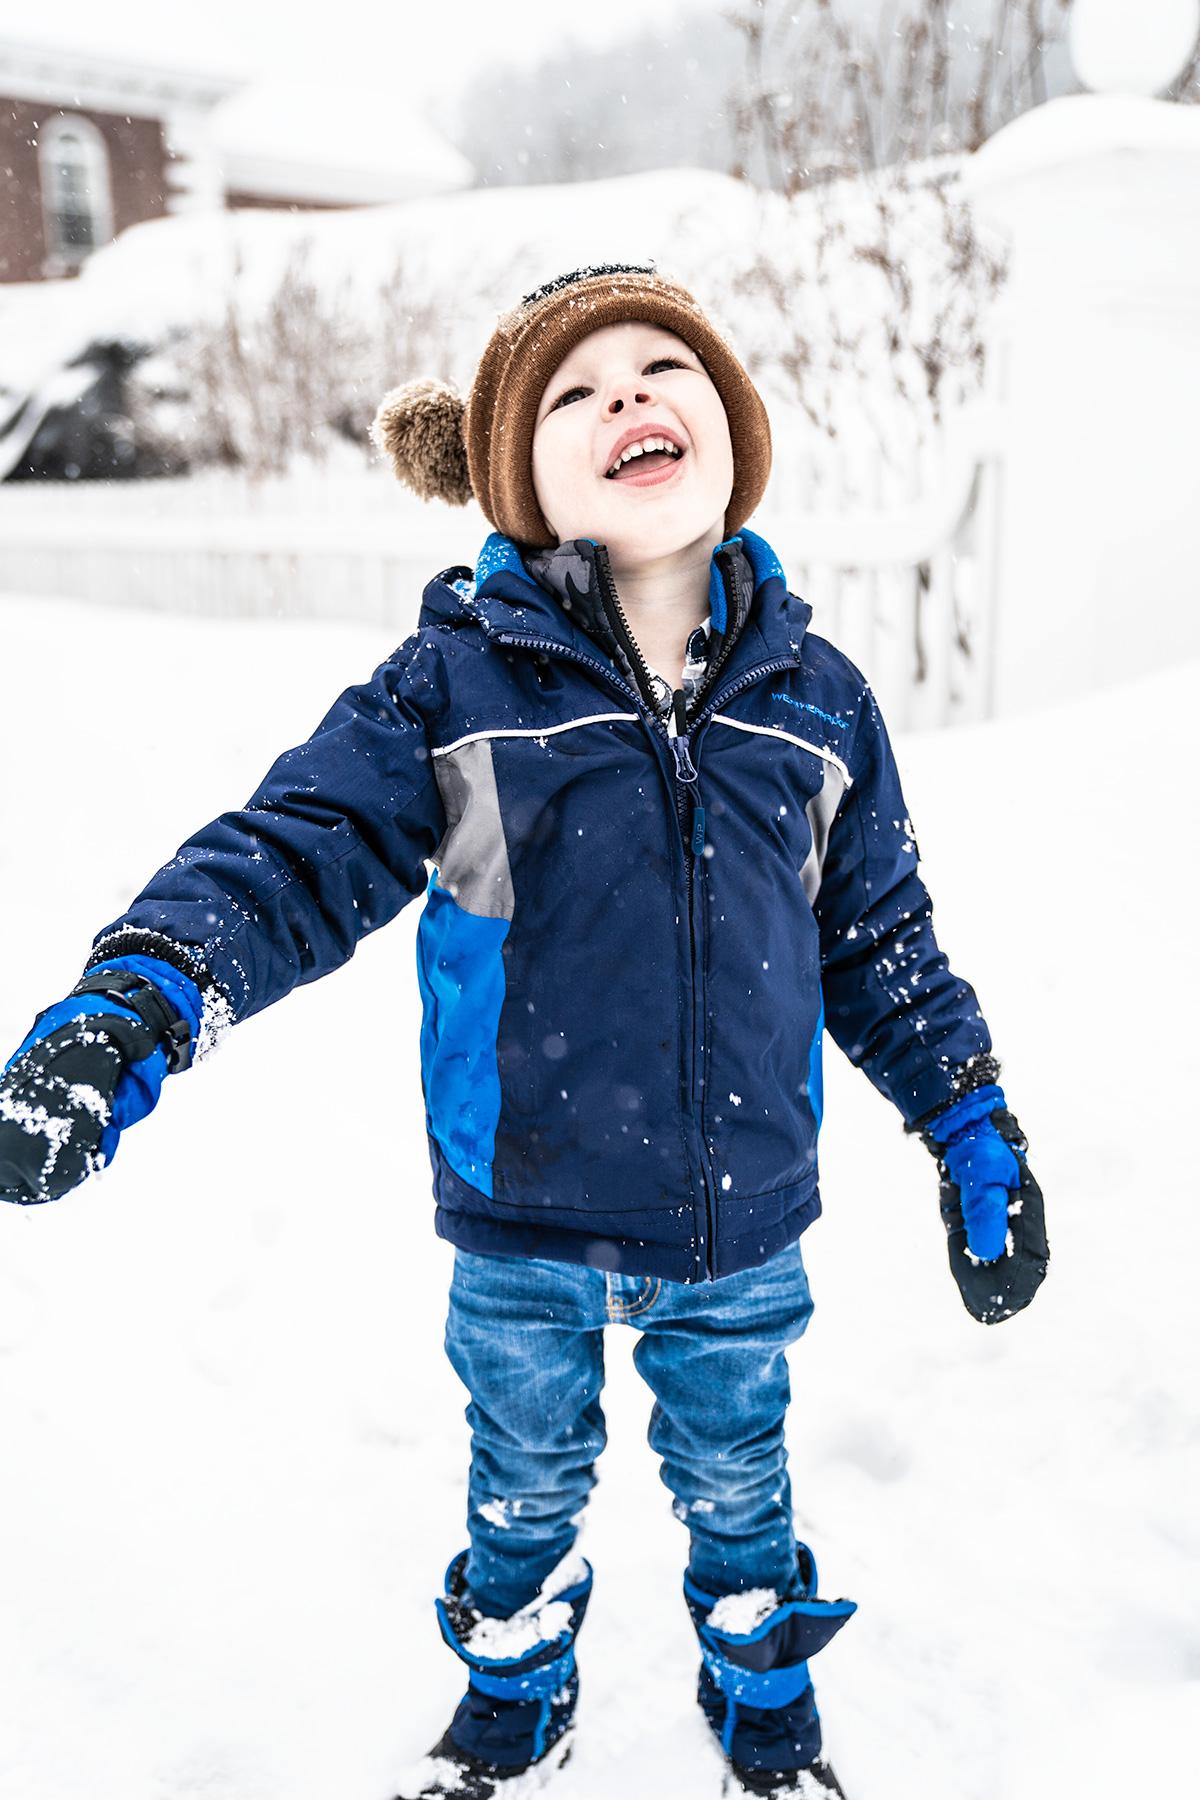 Trevor-Michael-Winter-in-Vermont